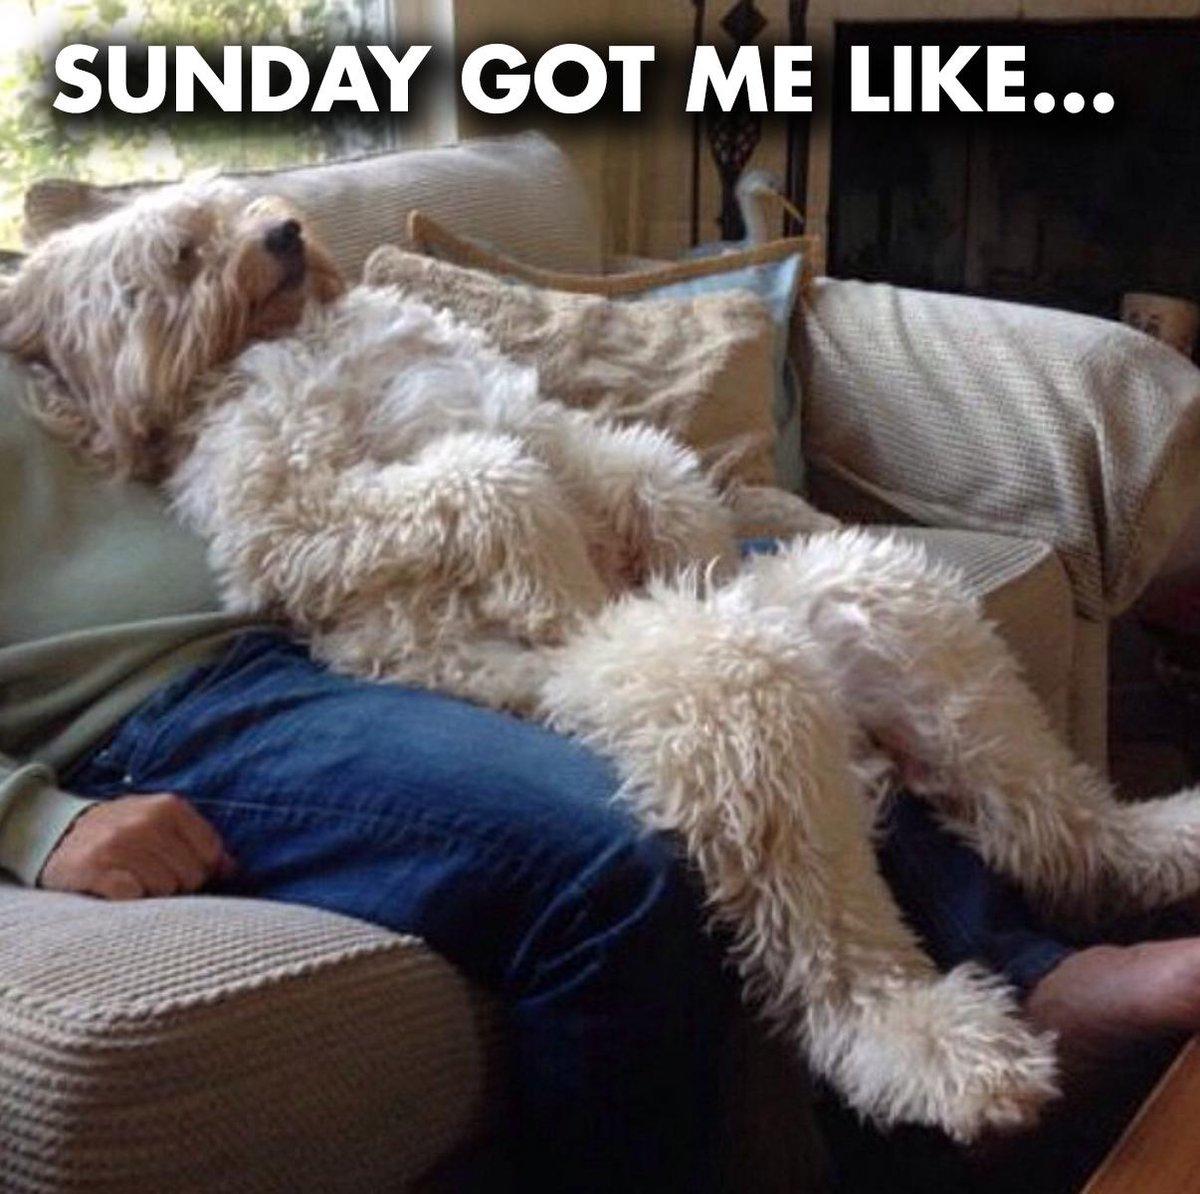 Sunday got me like…